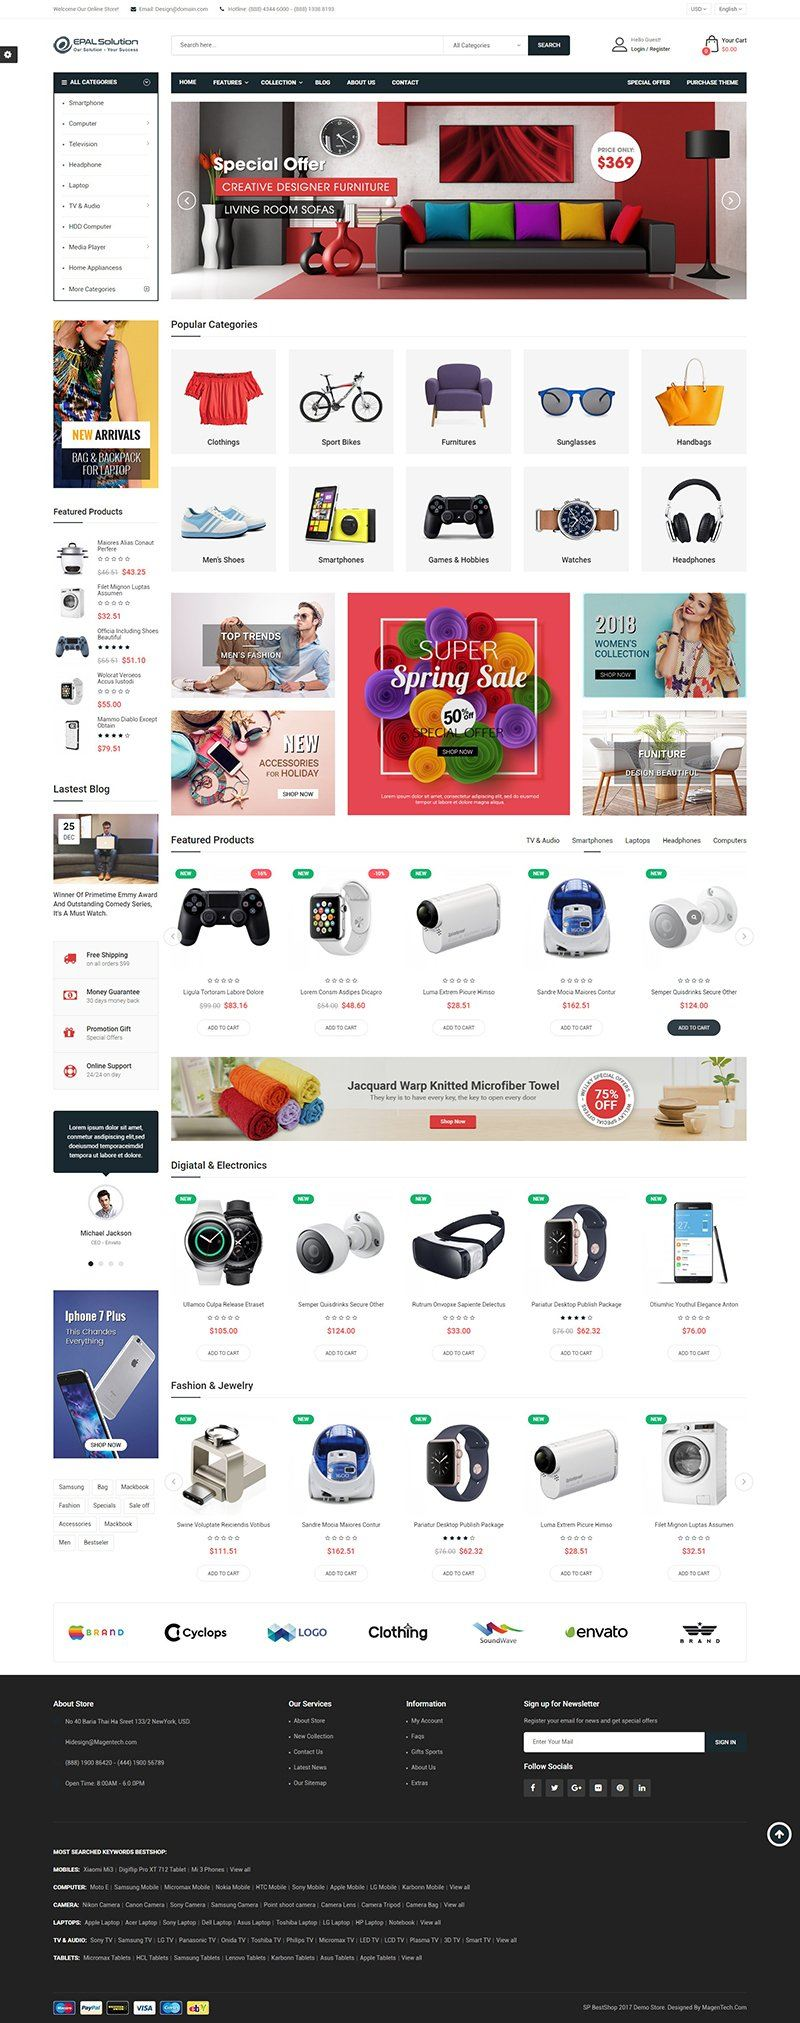 Giao-dien-website-thuong-mai-dien-tu-Bestshop